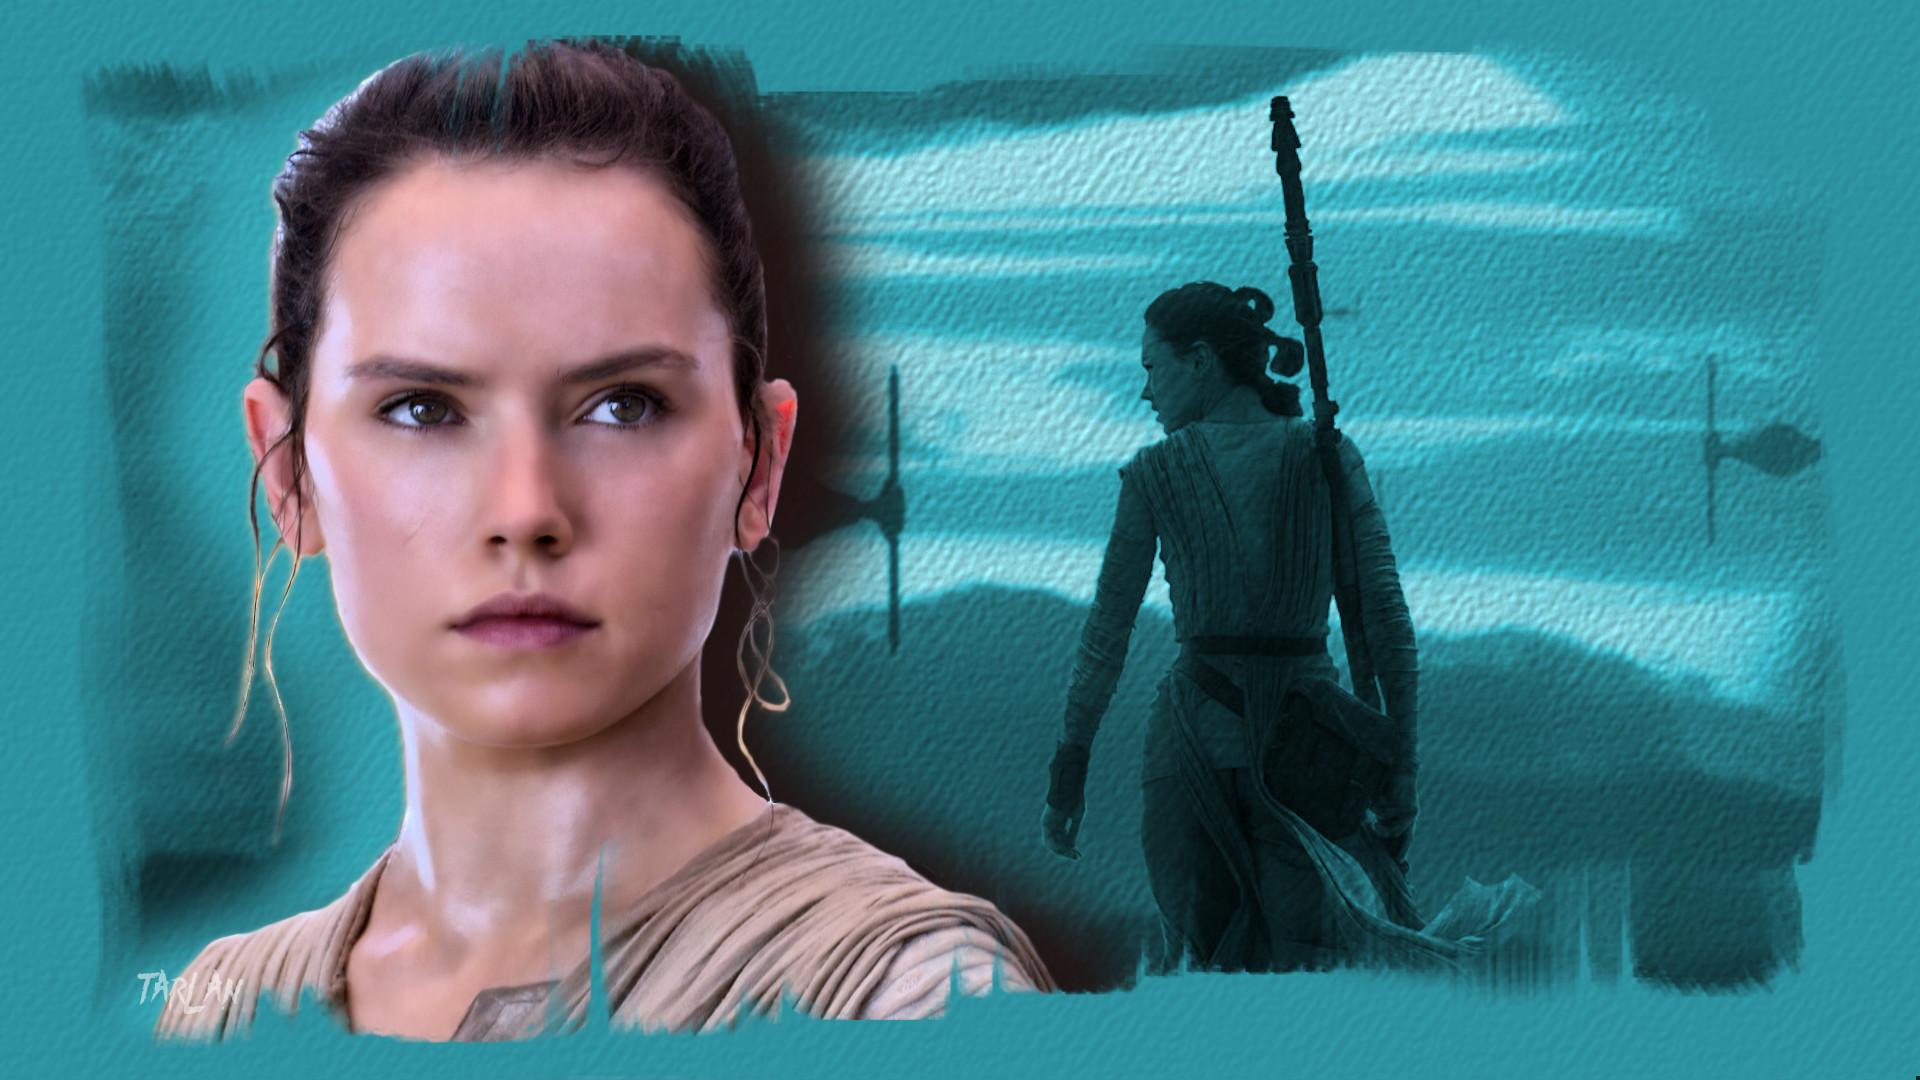 Rey - Star Wars by Tarlan